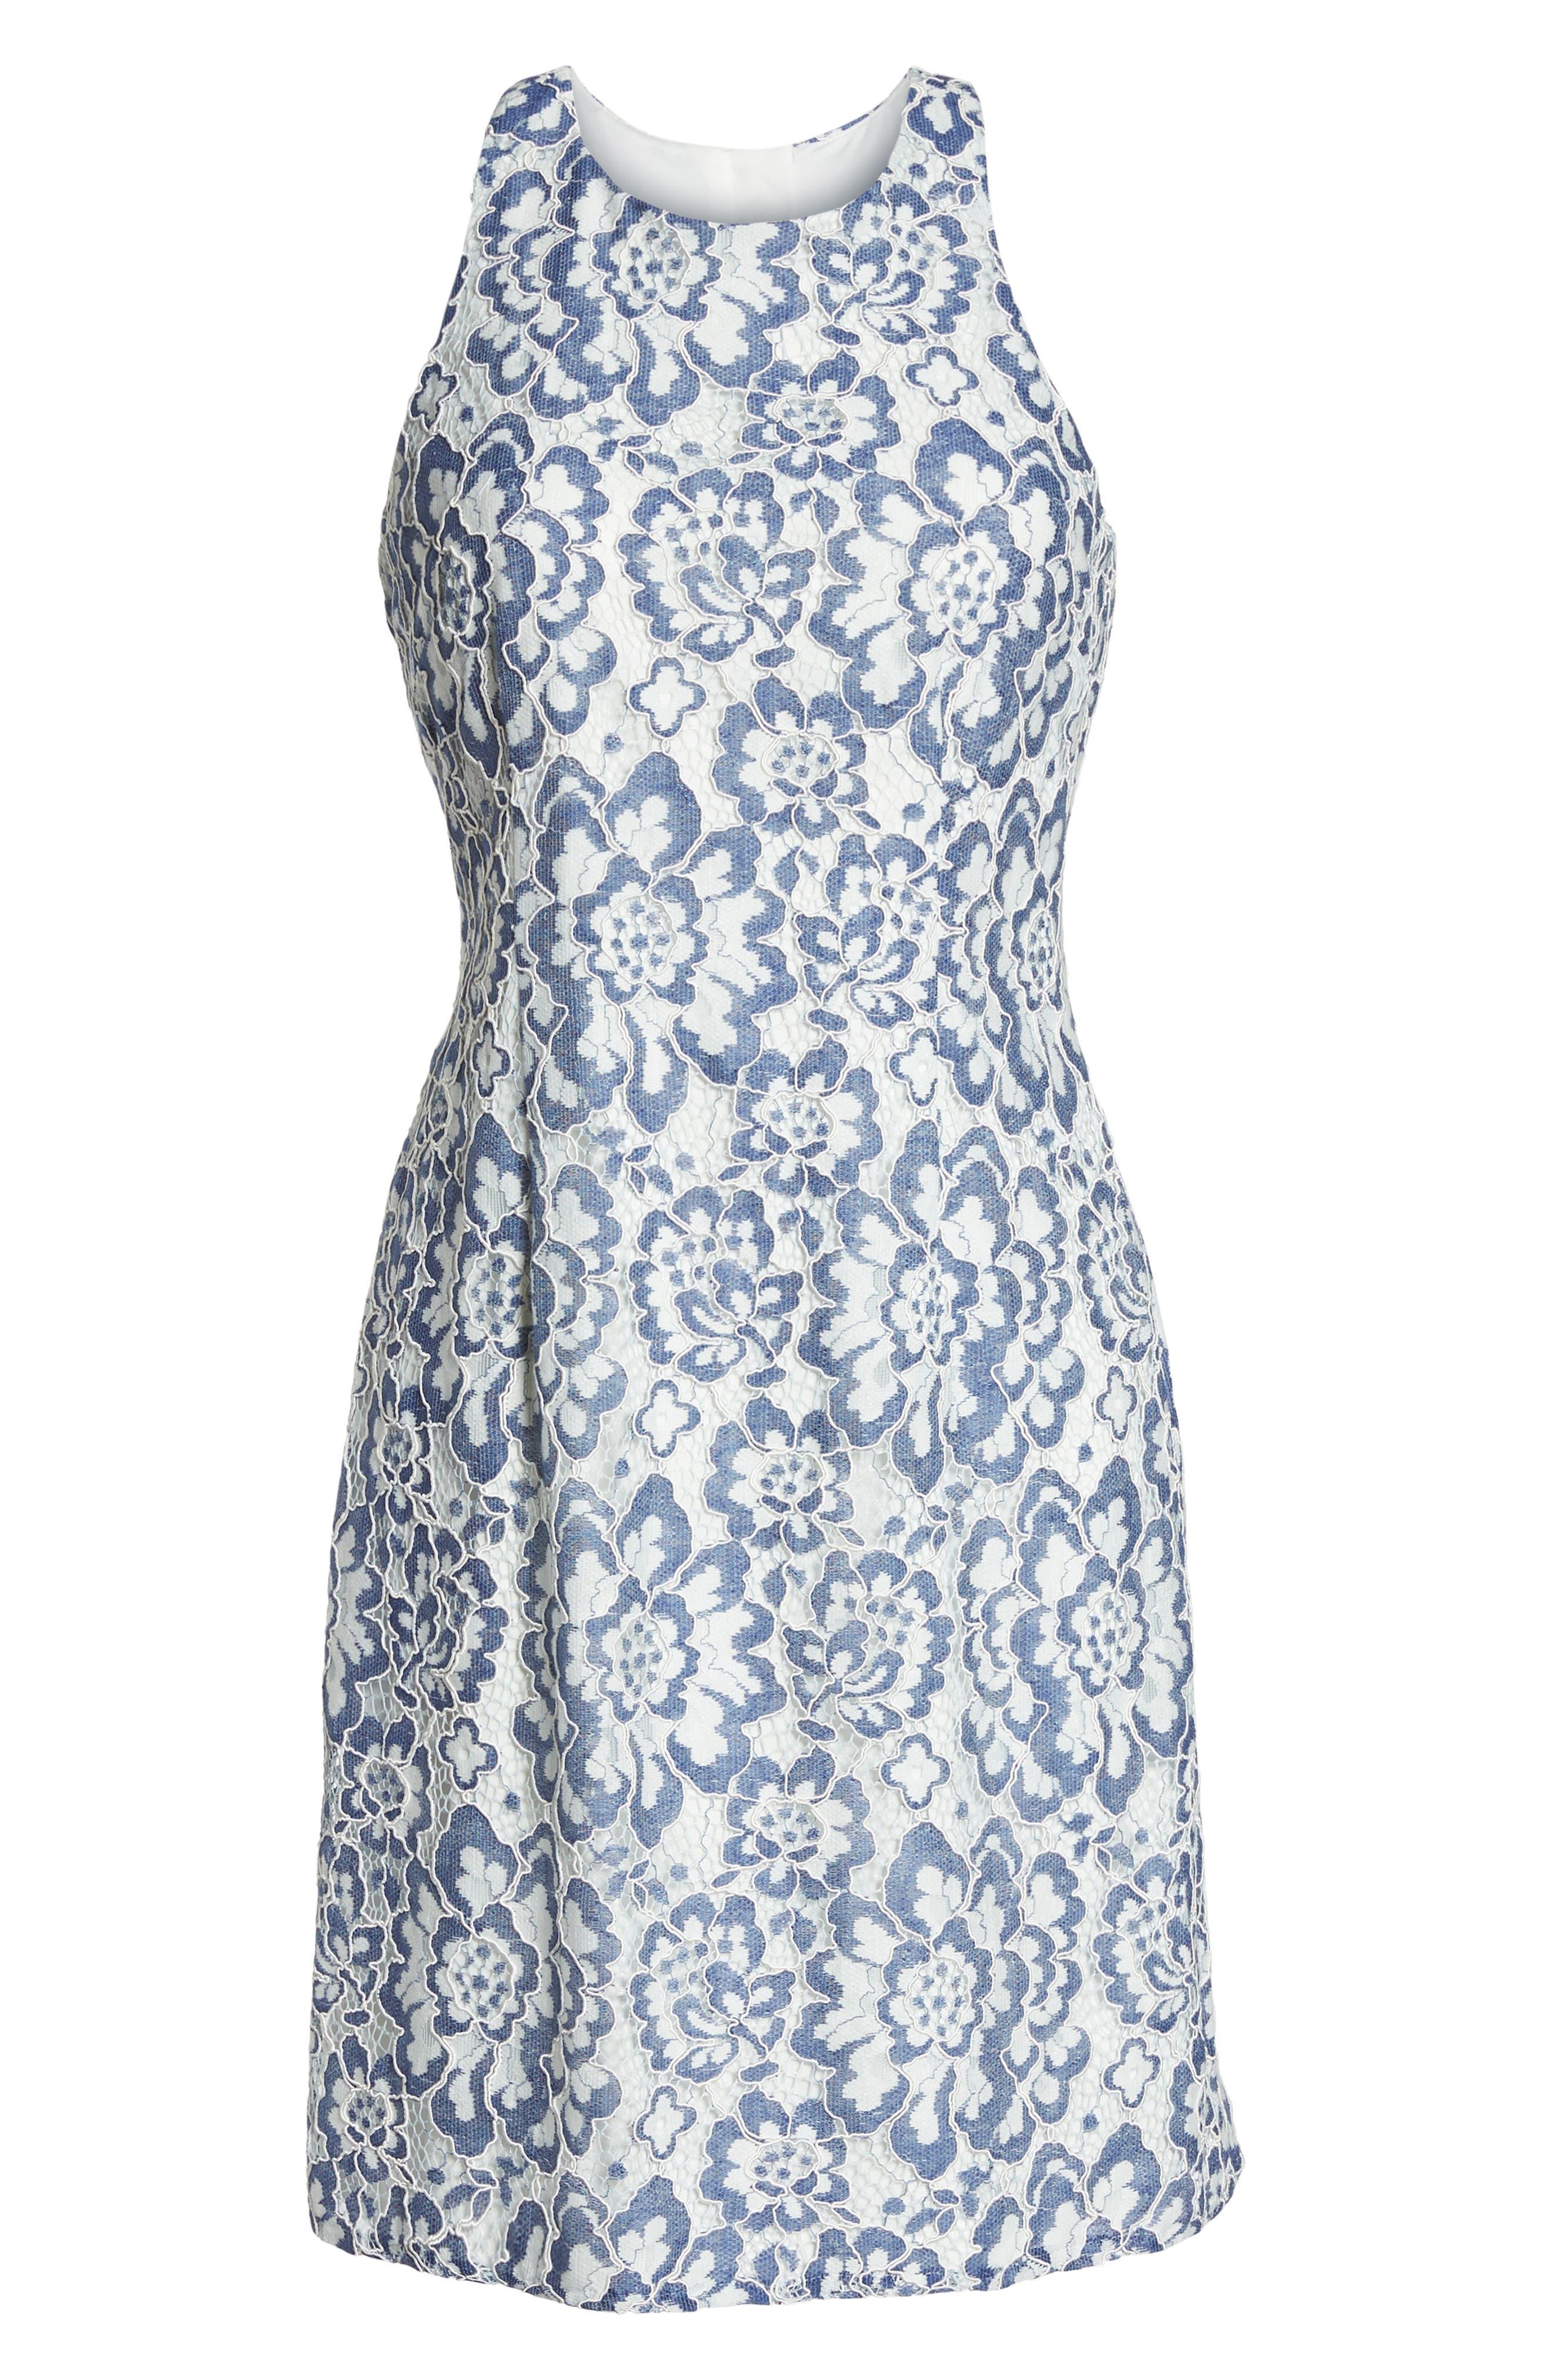 Elisa Two Tone Lace Sheath Dress,                             Alternate thumbnail 7, color,                             Blue/ White